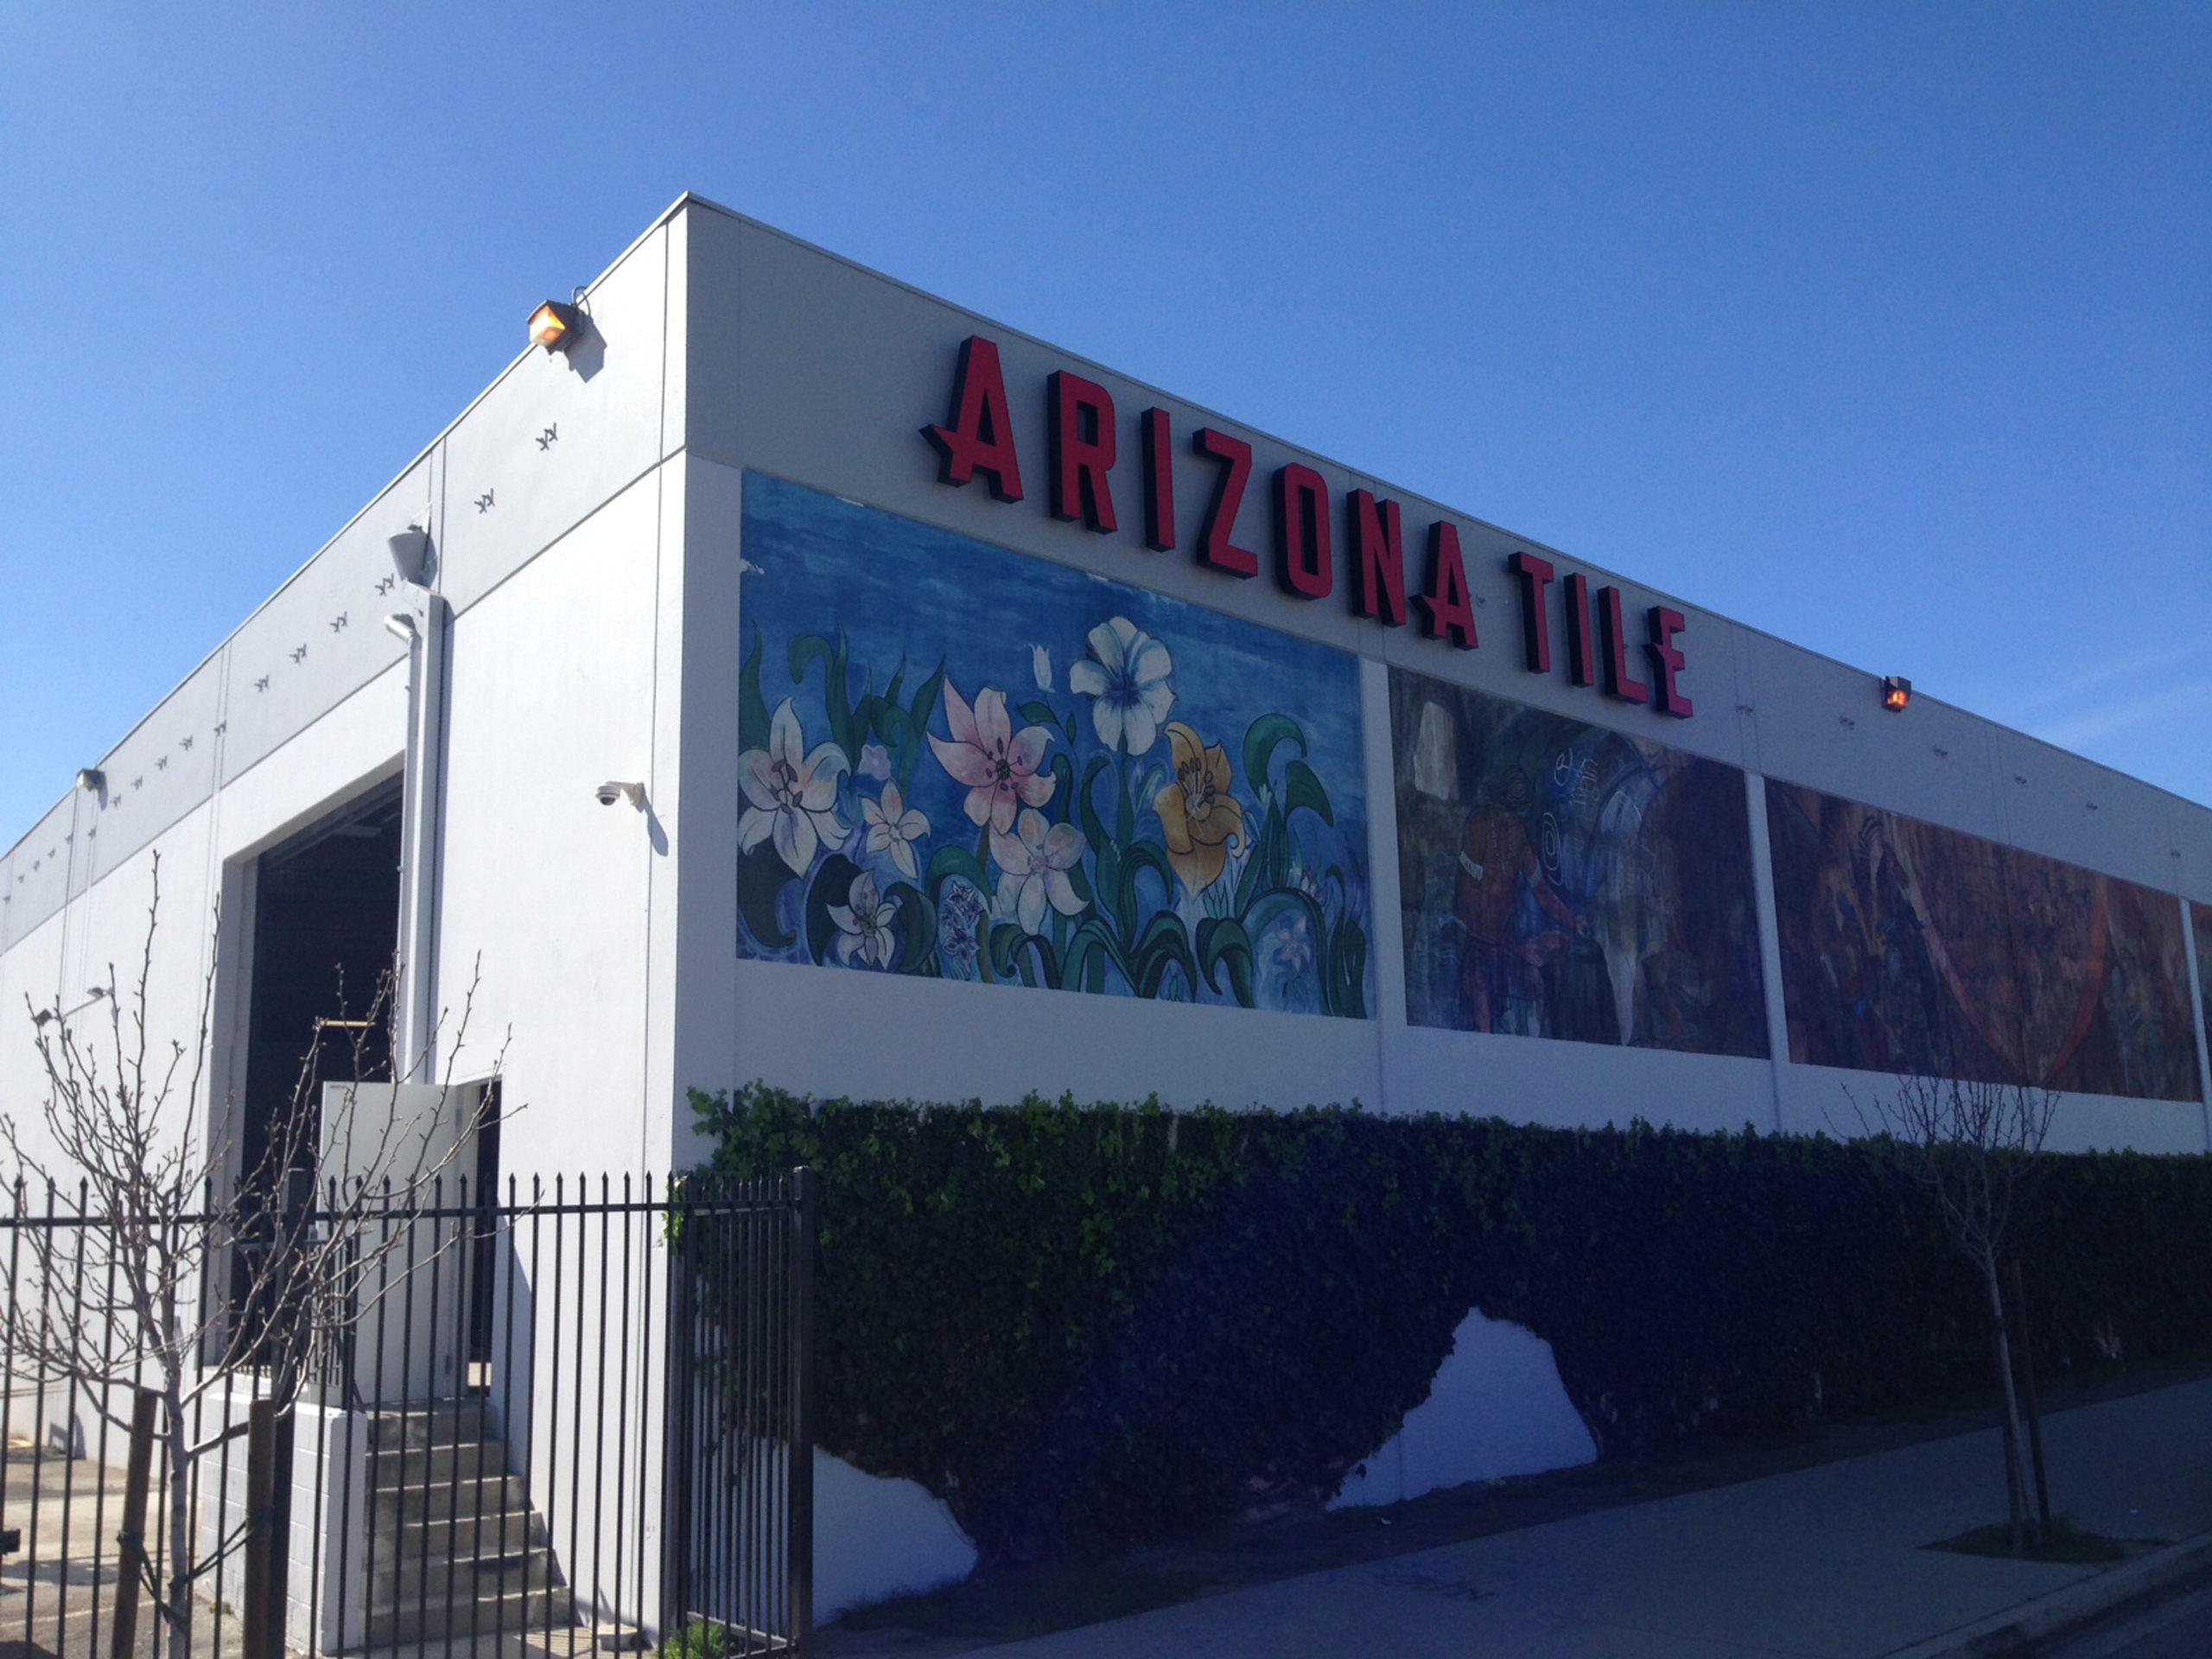 arizona tile van nuys location moves to